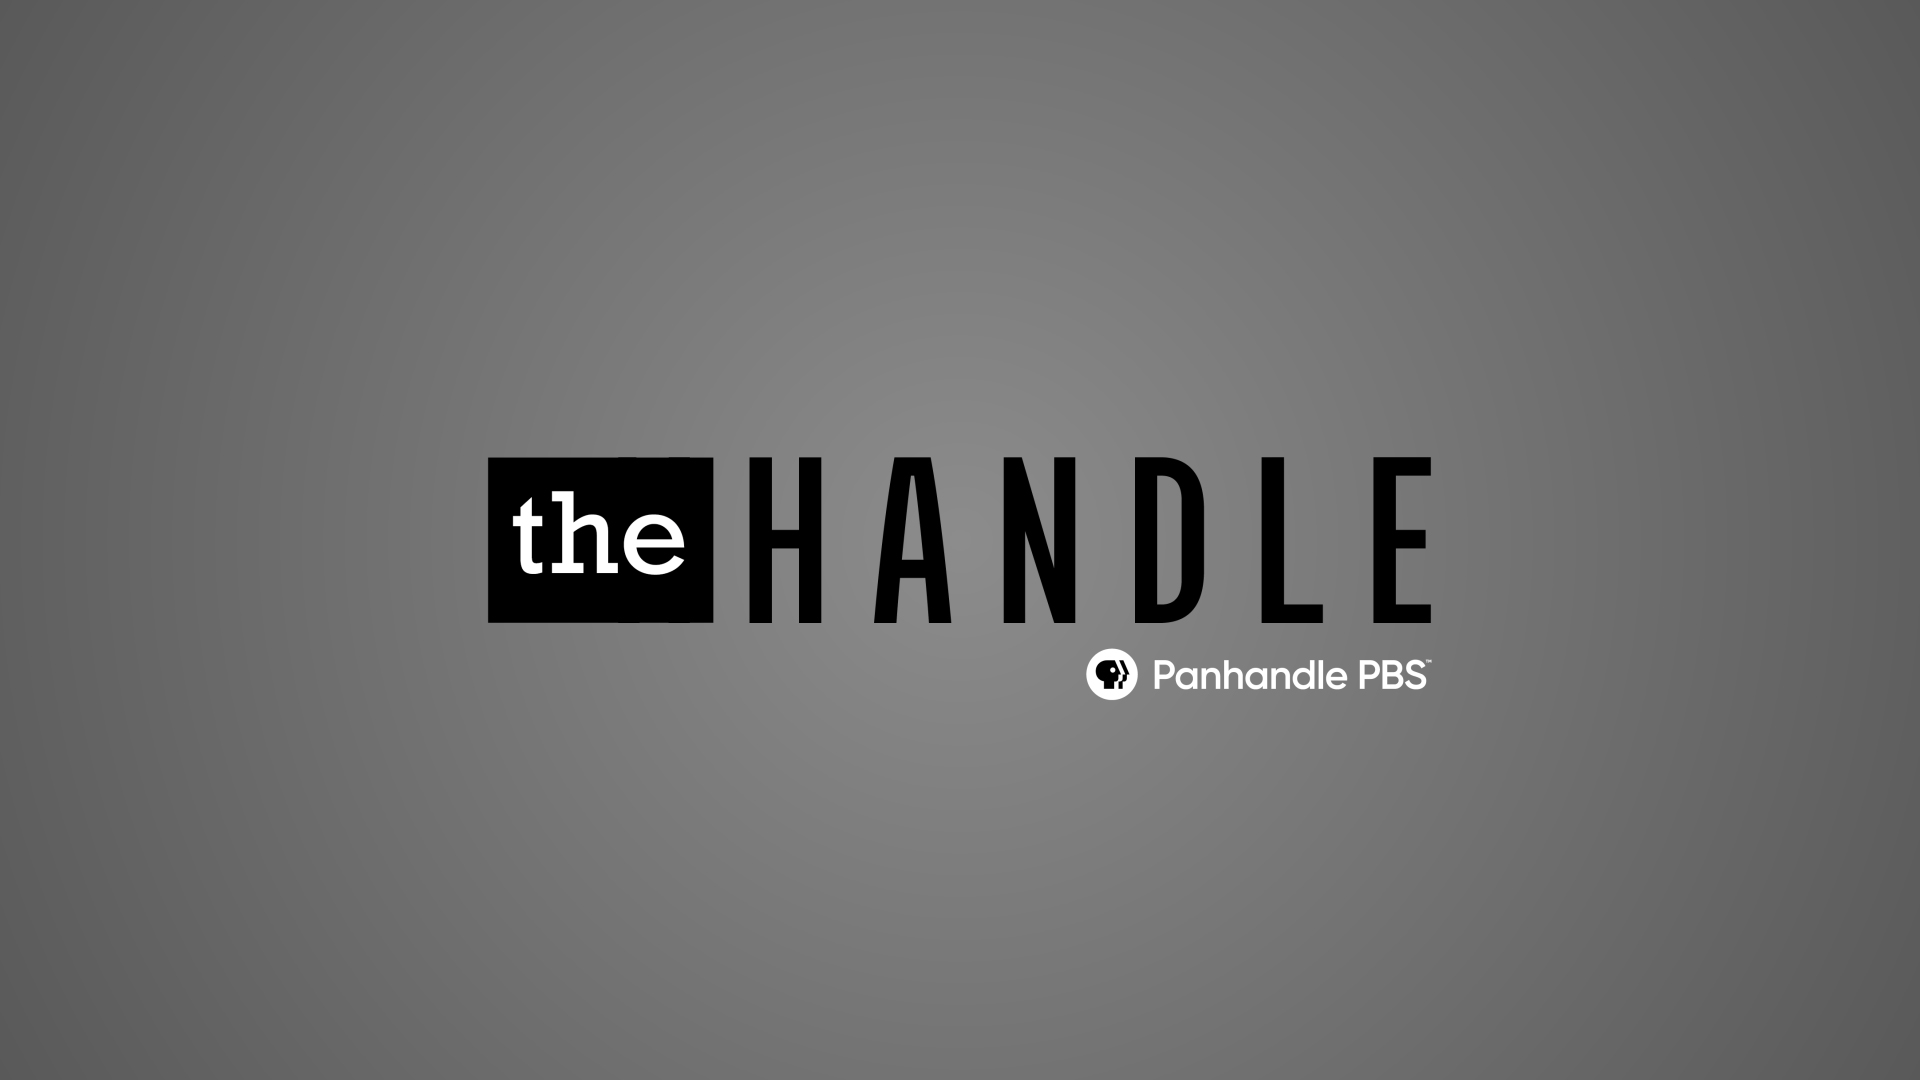 The Handle Premiere